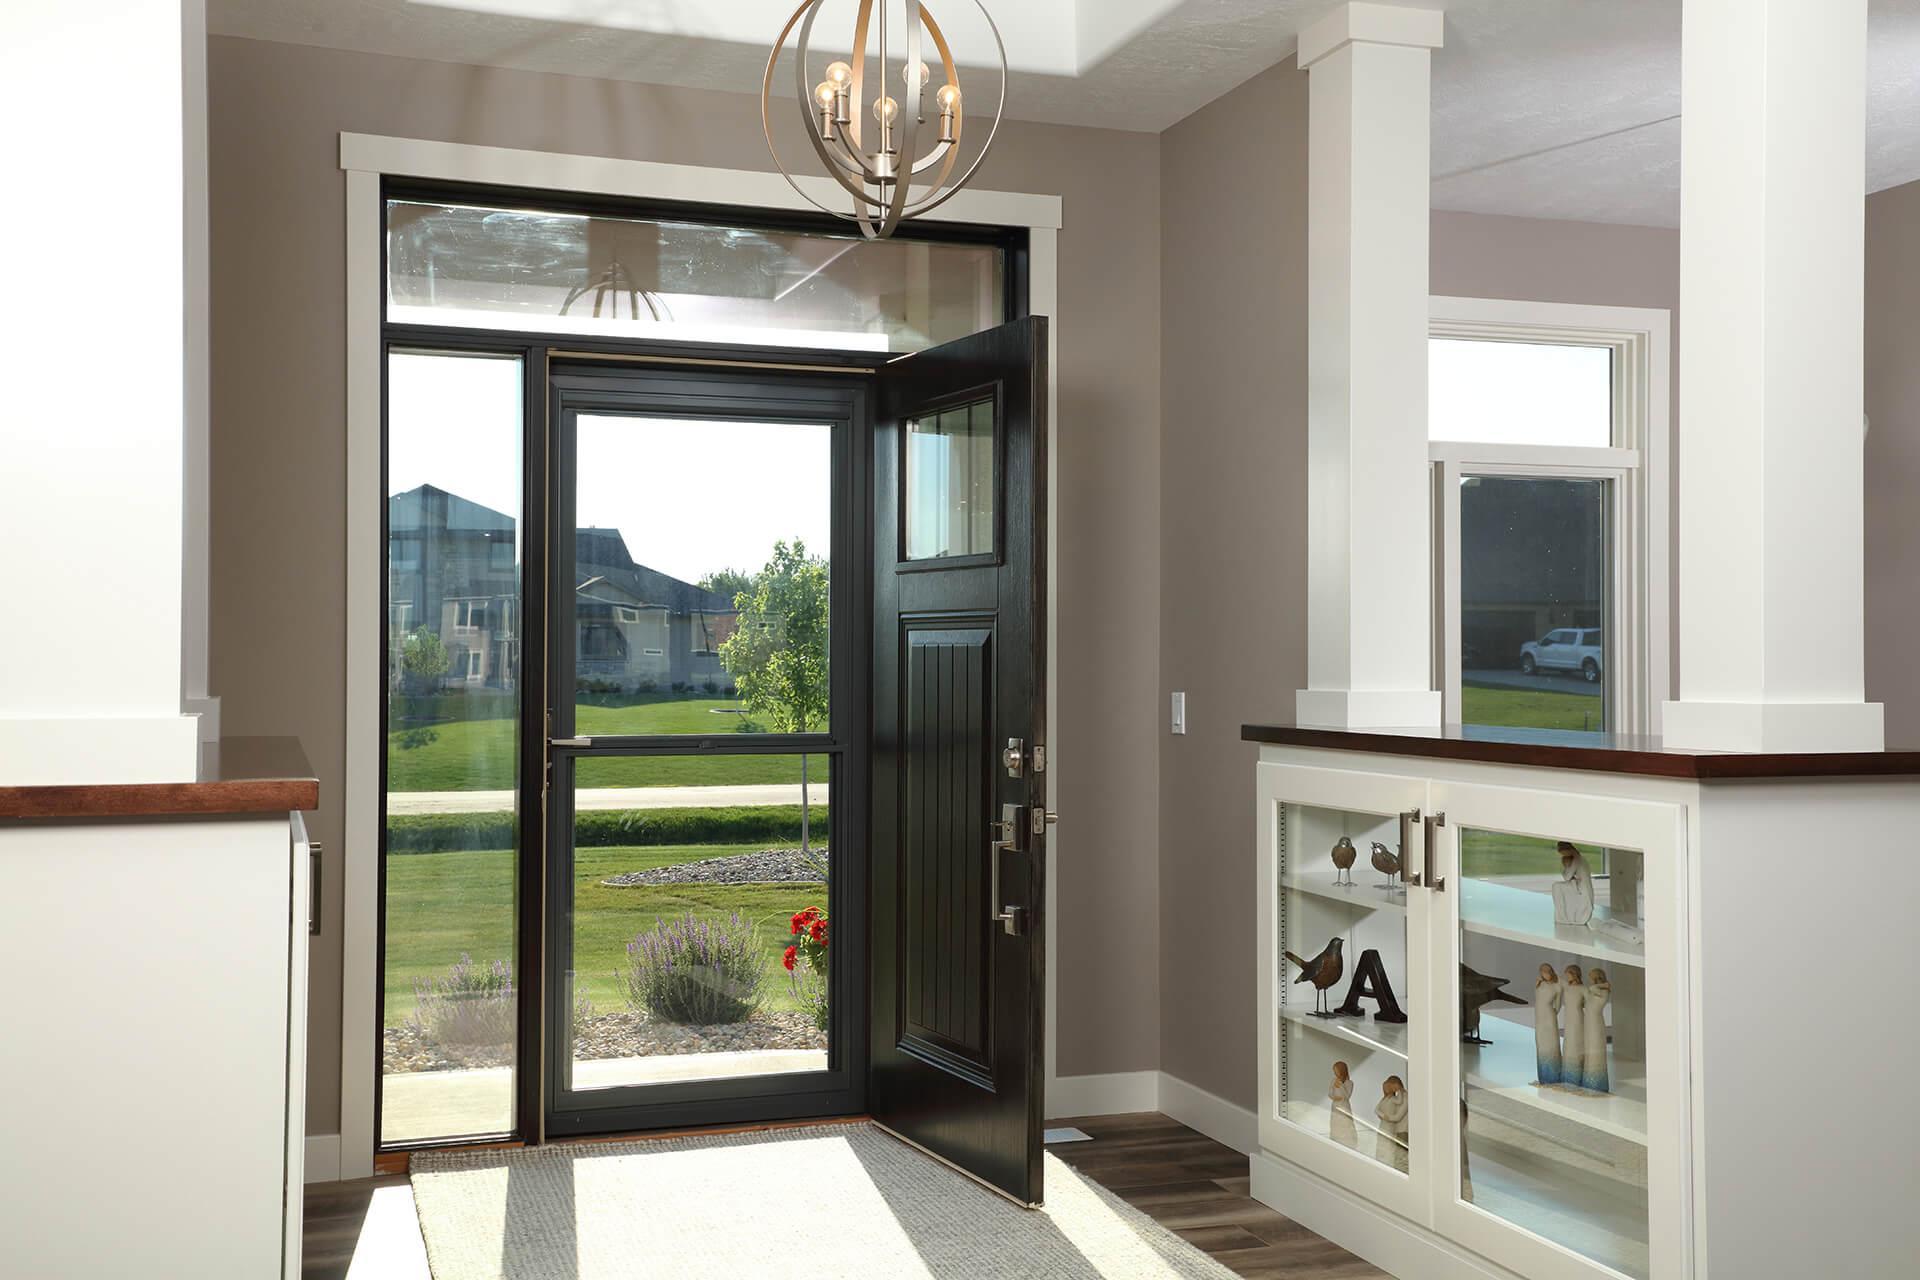 An entryway with an open entry door letting sunlight in through the storm door